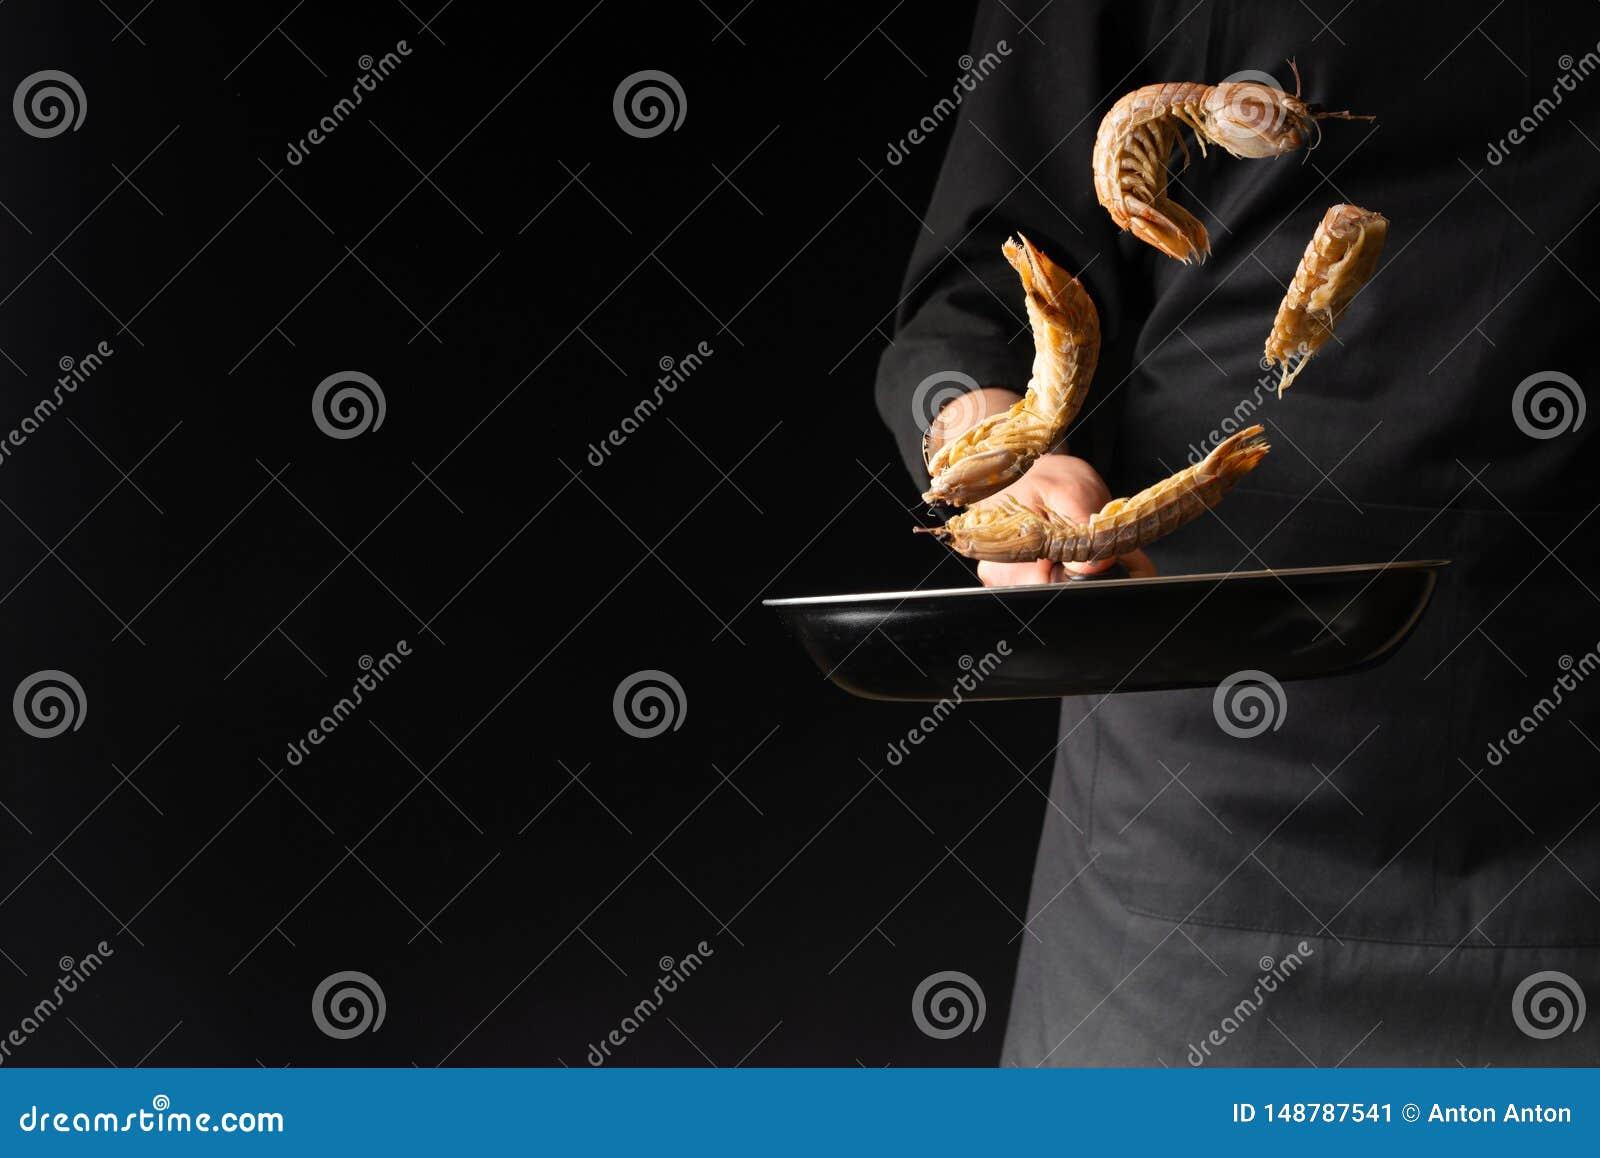 Chef preparing sea food, praying mantis shrimp, East Asian cuisine, dilikates, on a black background, horizontal photo, Thai or